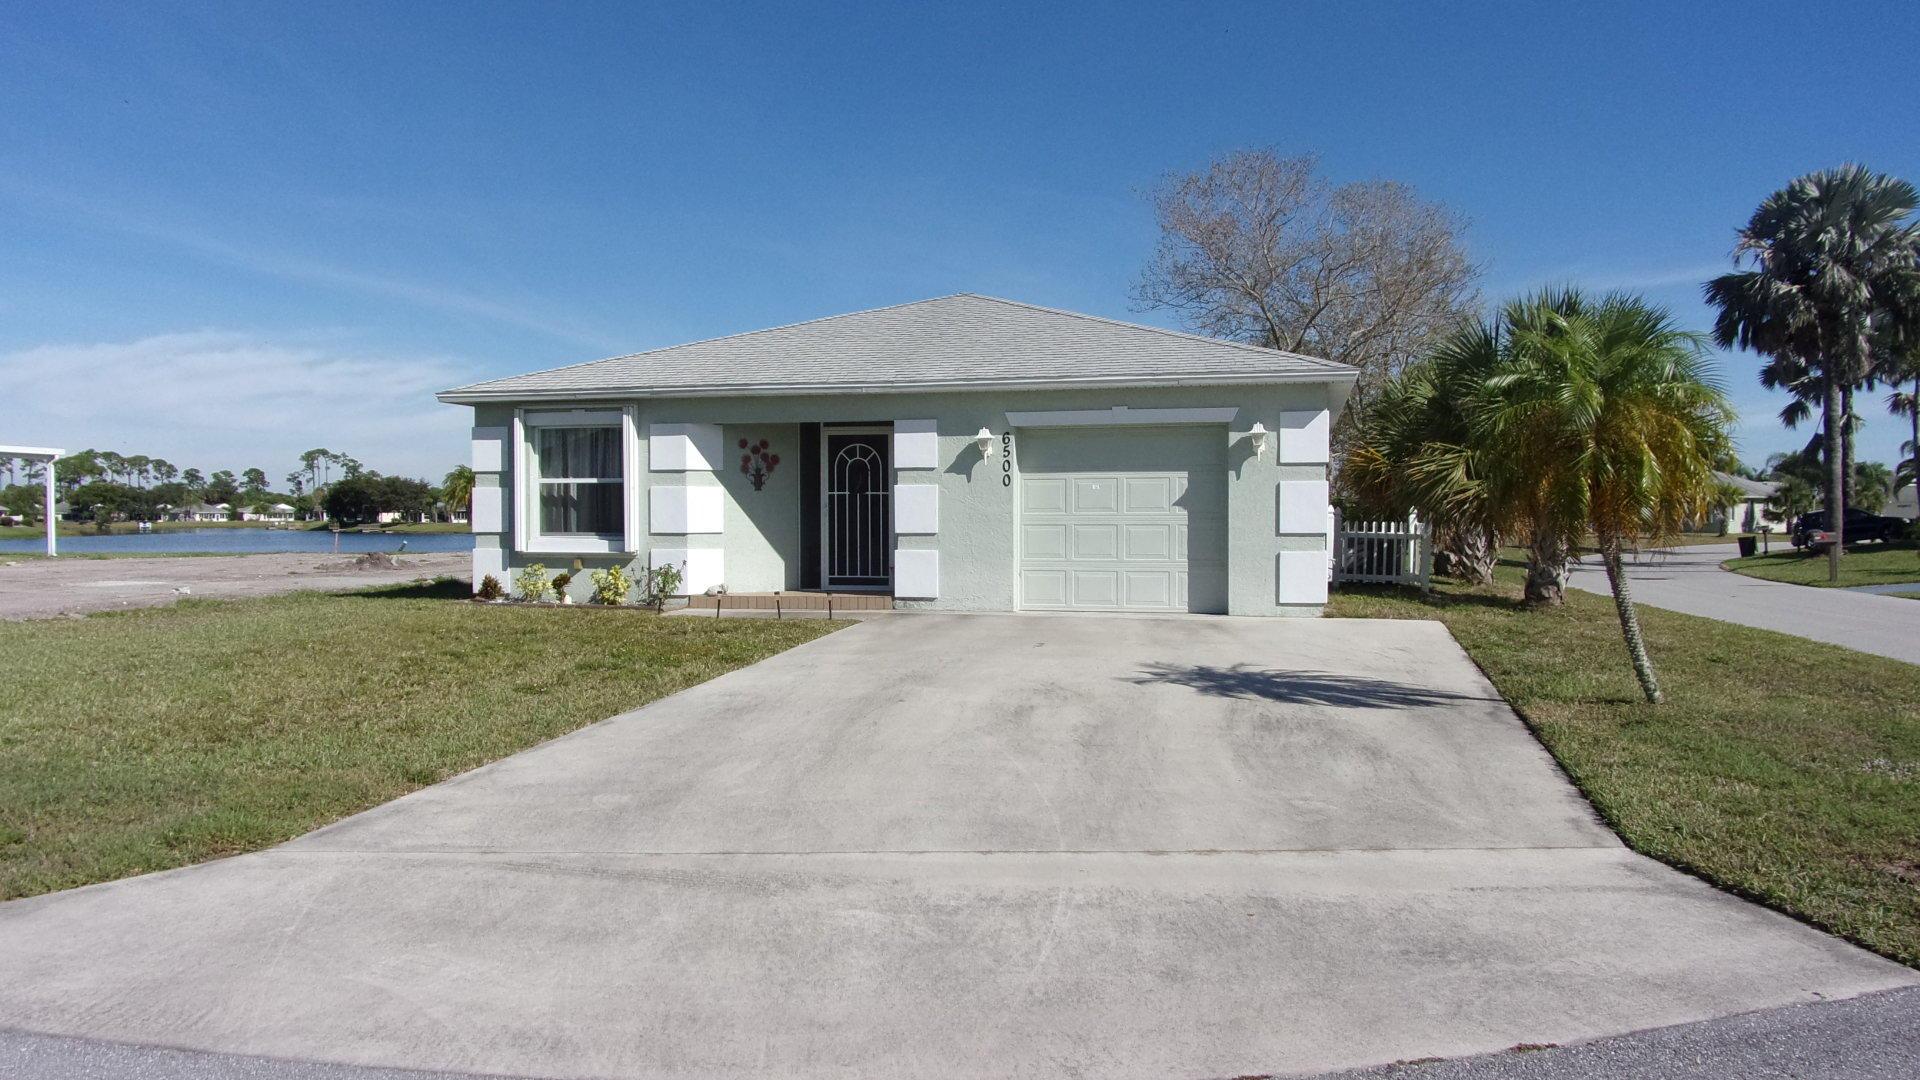 6500 Teresita Court, Fort Pierce, FL 34951